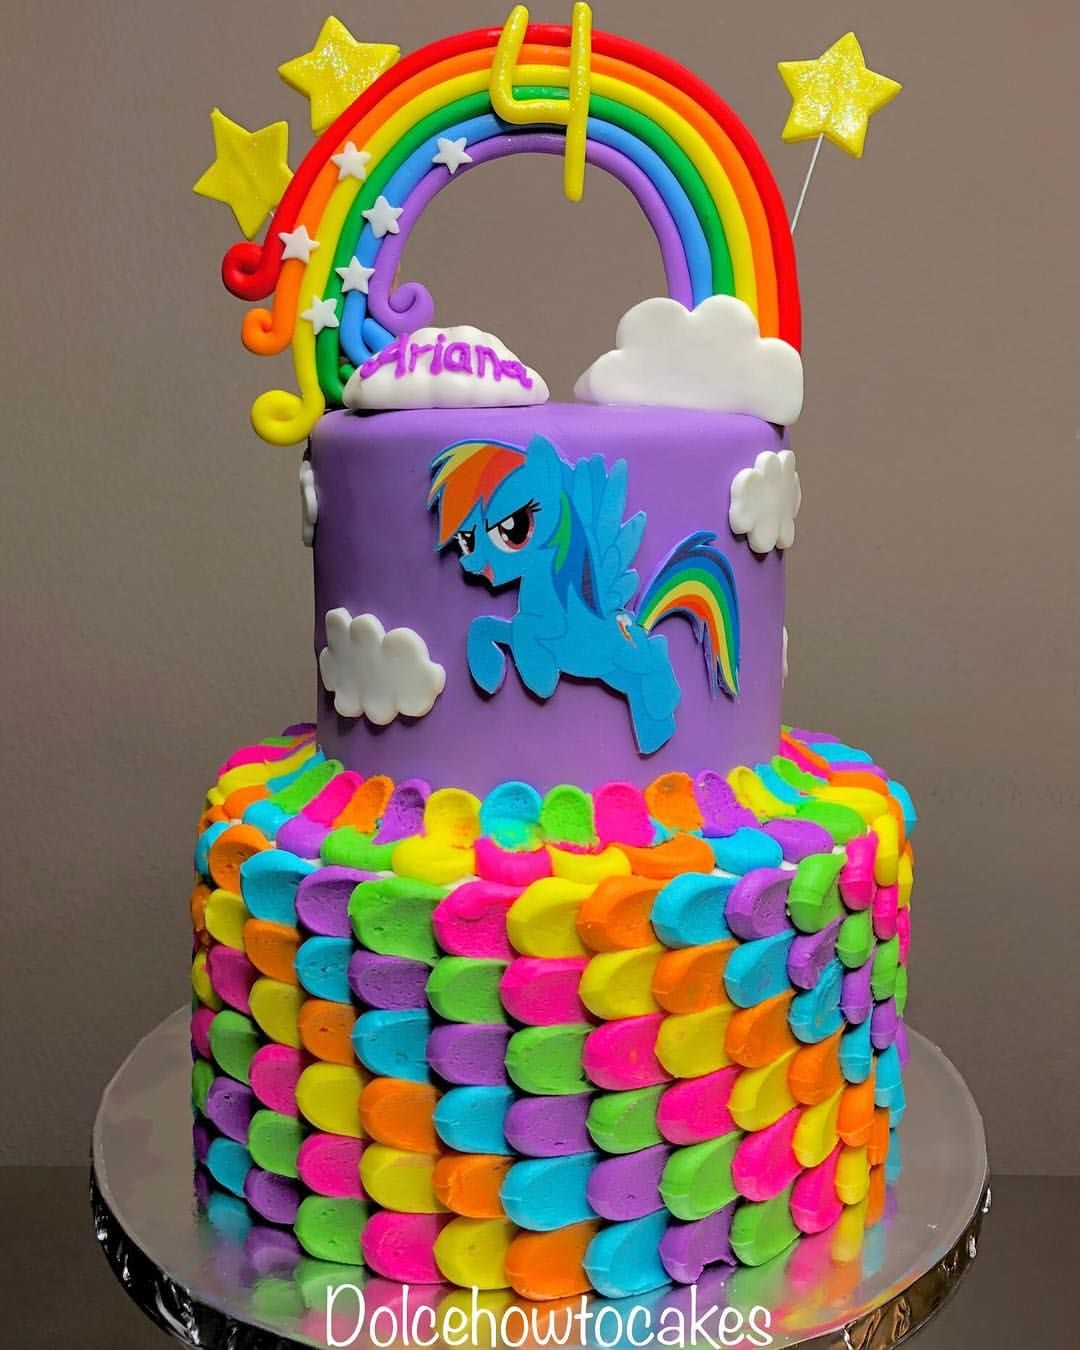 Remarkable Happy Birthday Ariana Mylittlepony Mylittleponycake Cake Funny Birthday Cards Online Fluifree Goldxyz